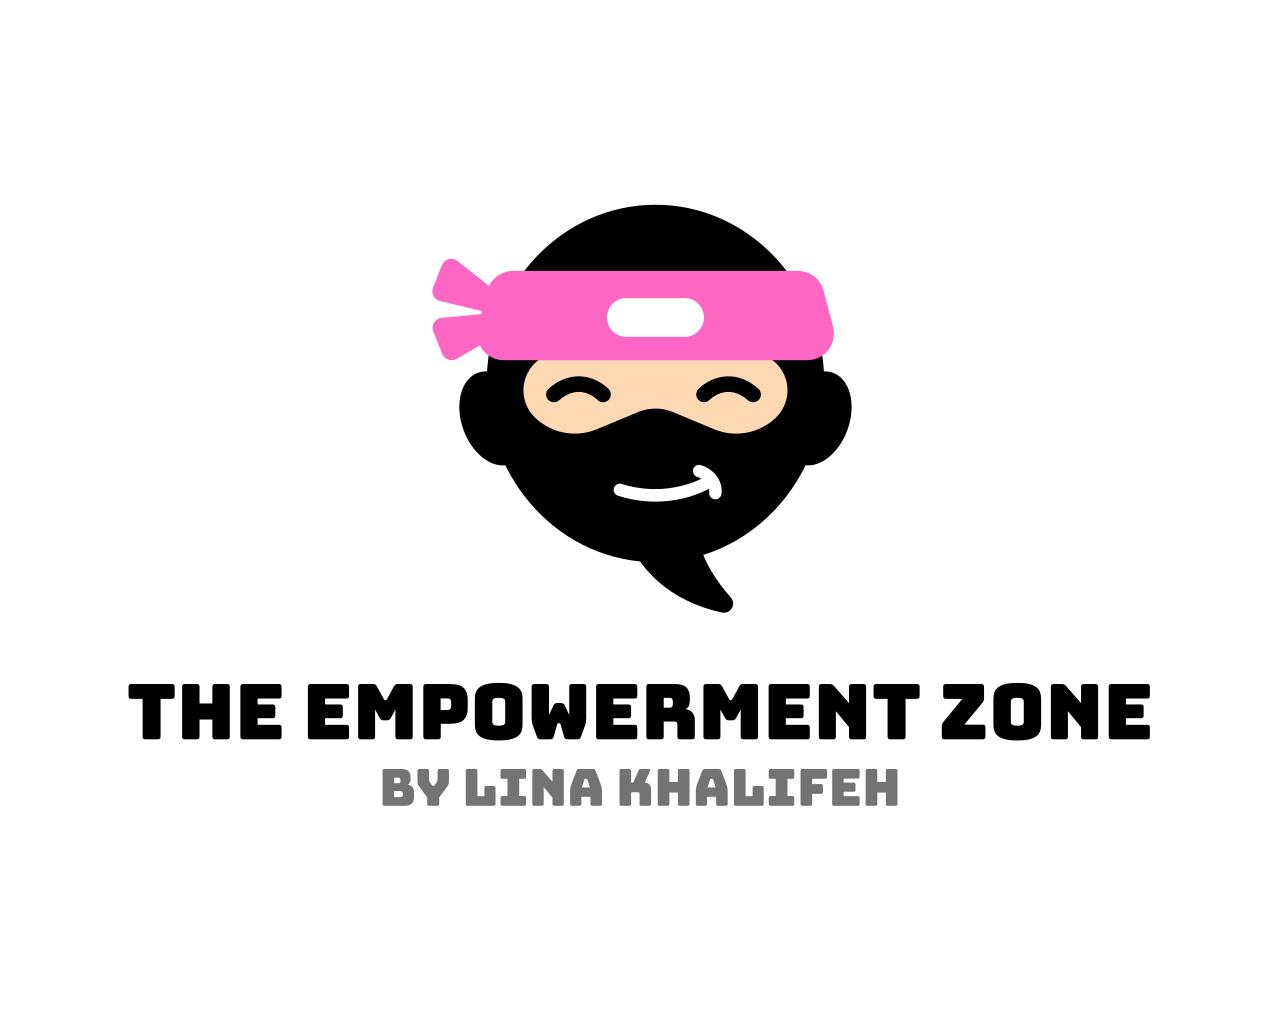 The Empowerment zone